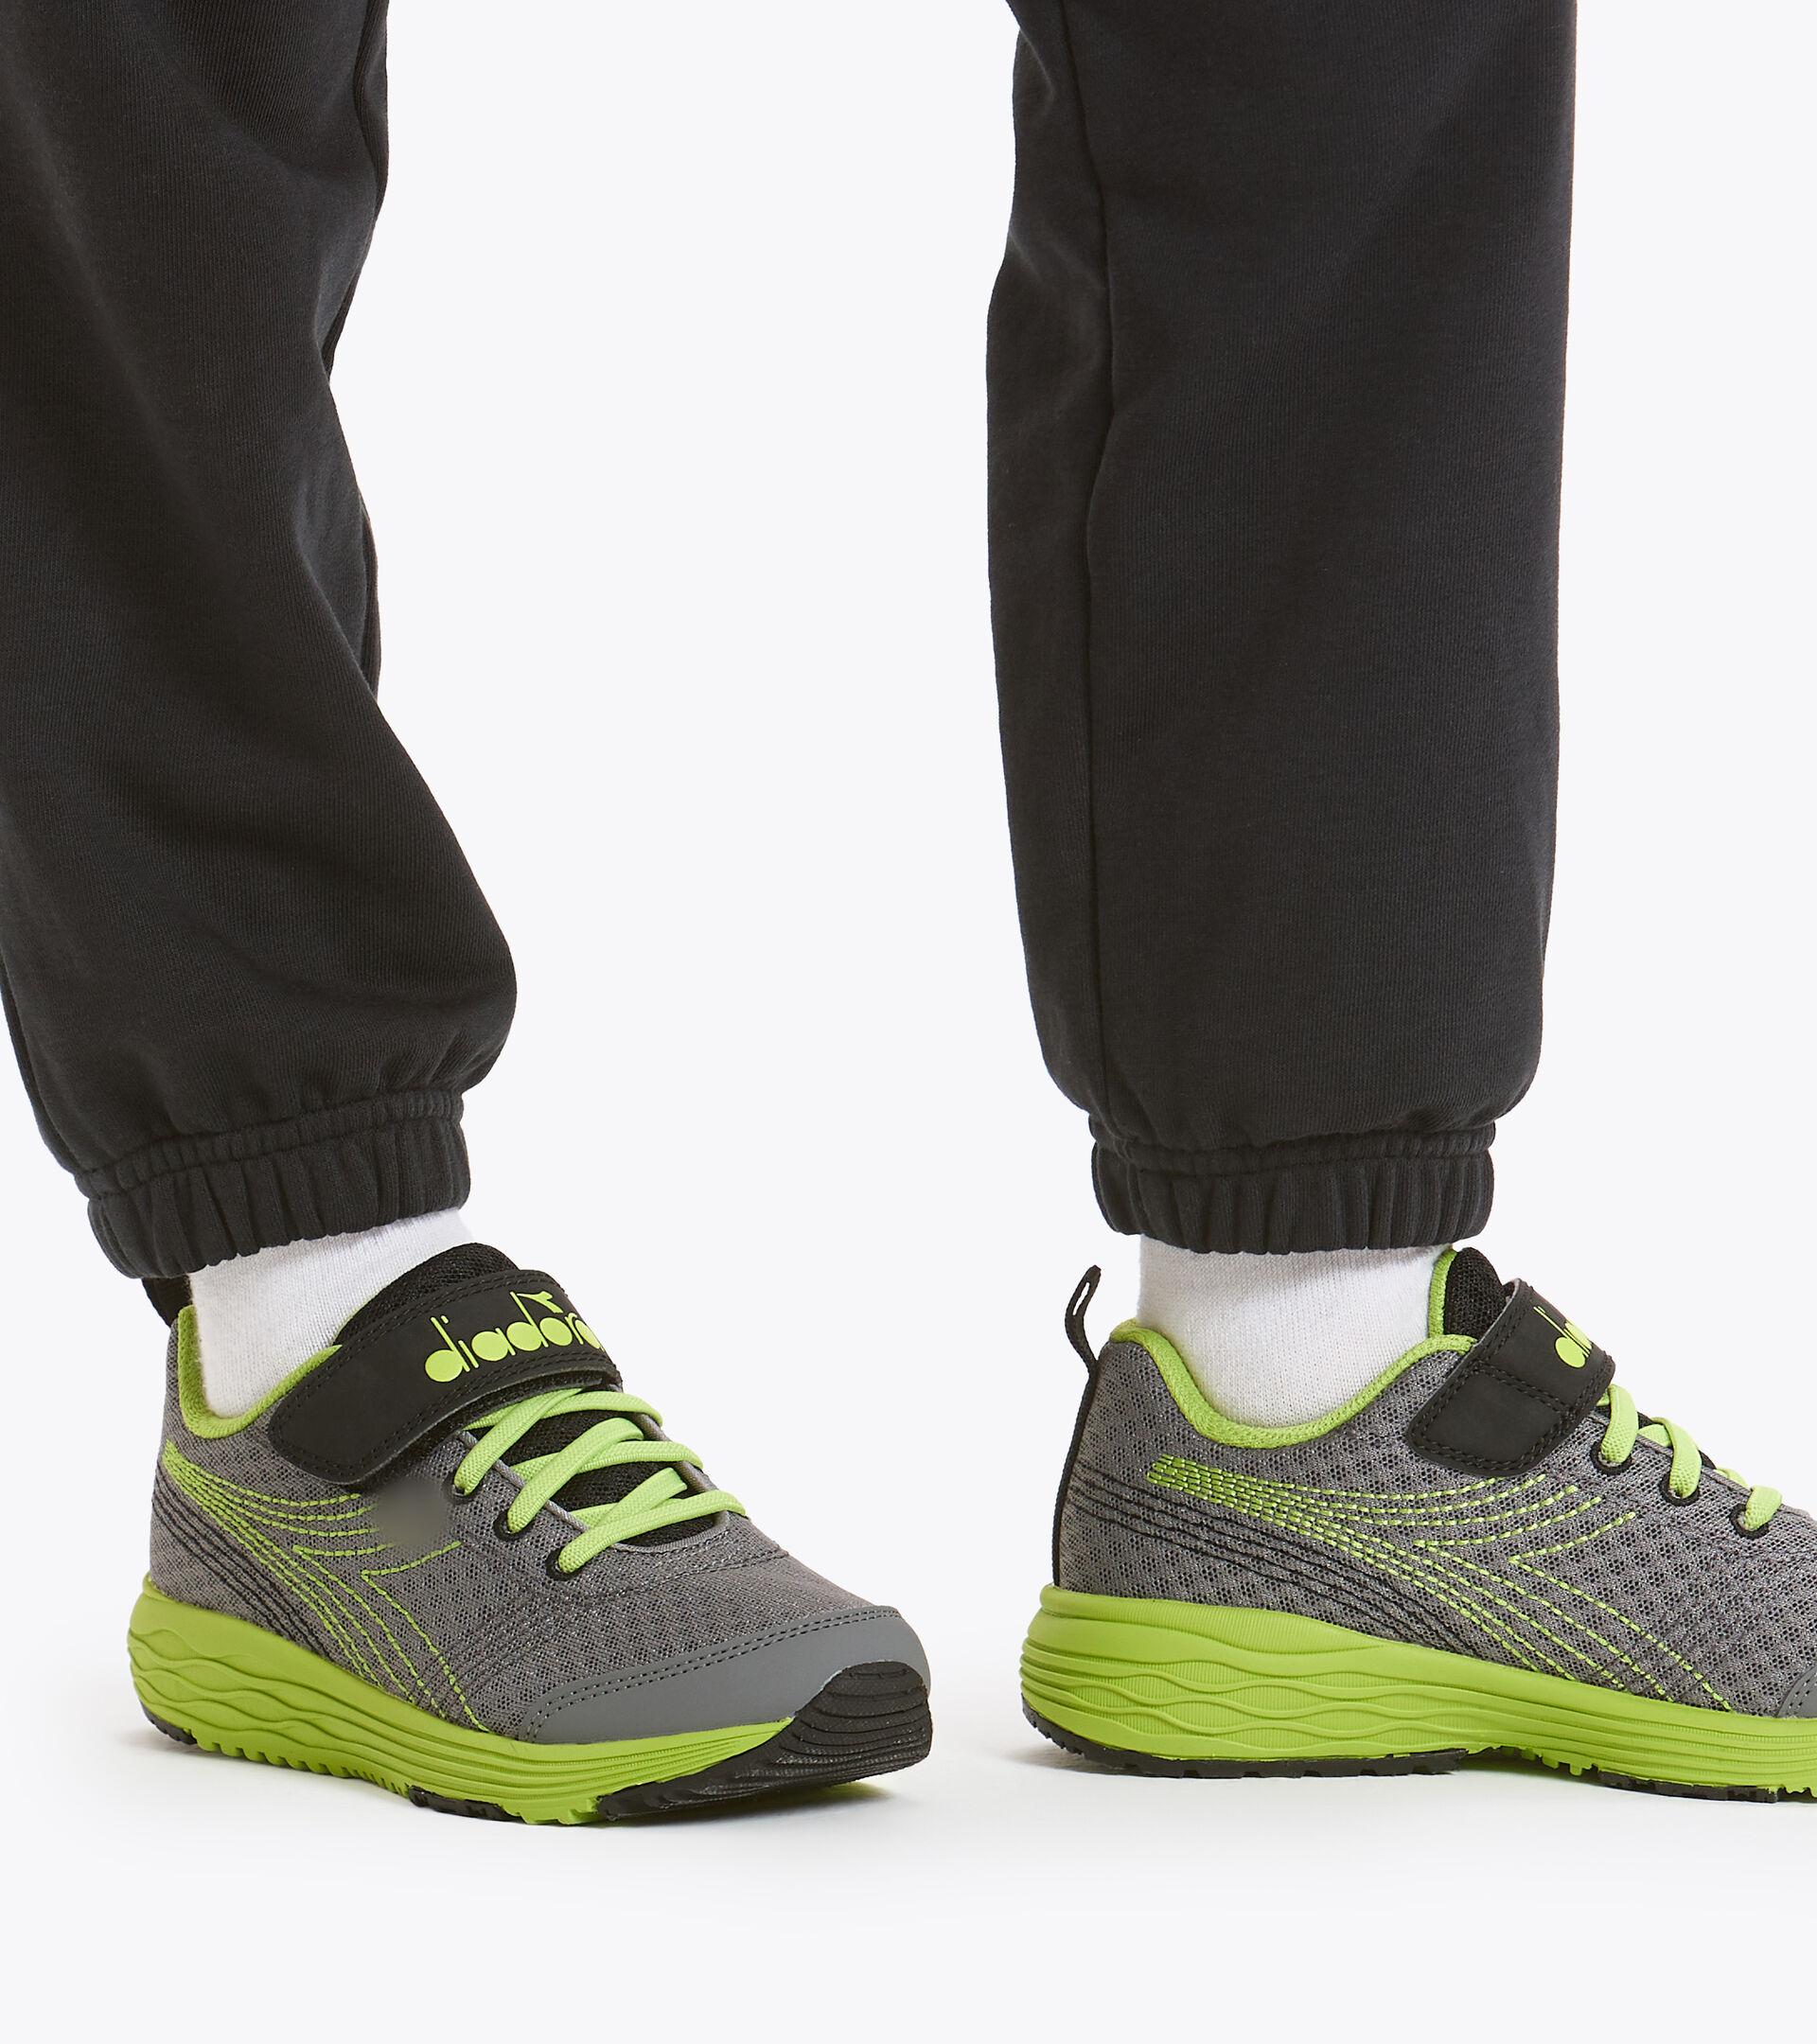 Footwear Sport BAMBINO FLAMINGO 6 JR STEEL GRAY/LIME PUNCH Diadora